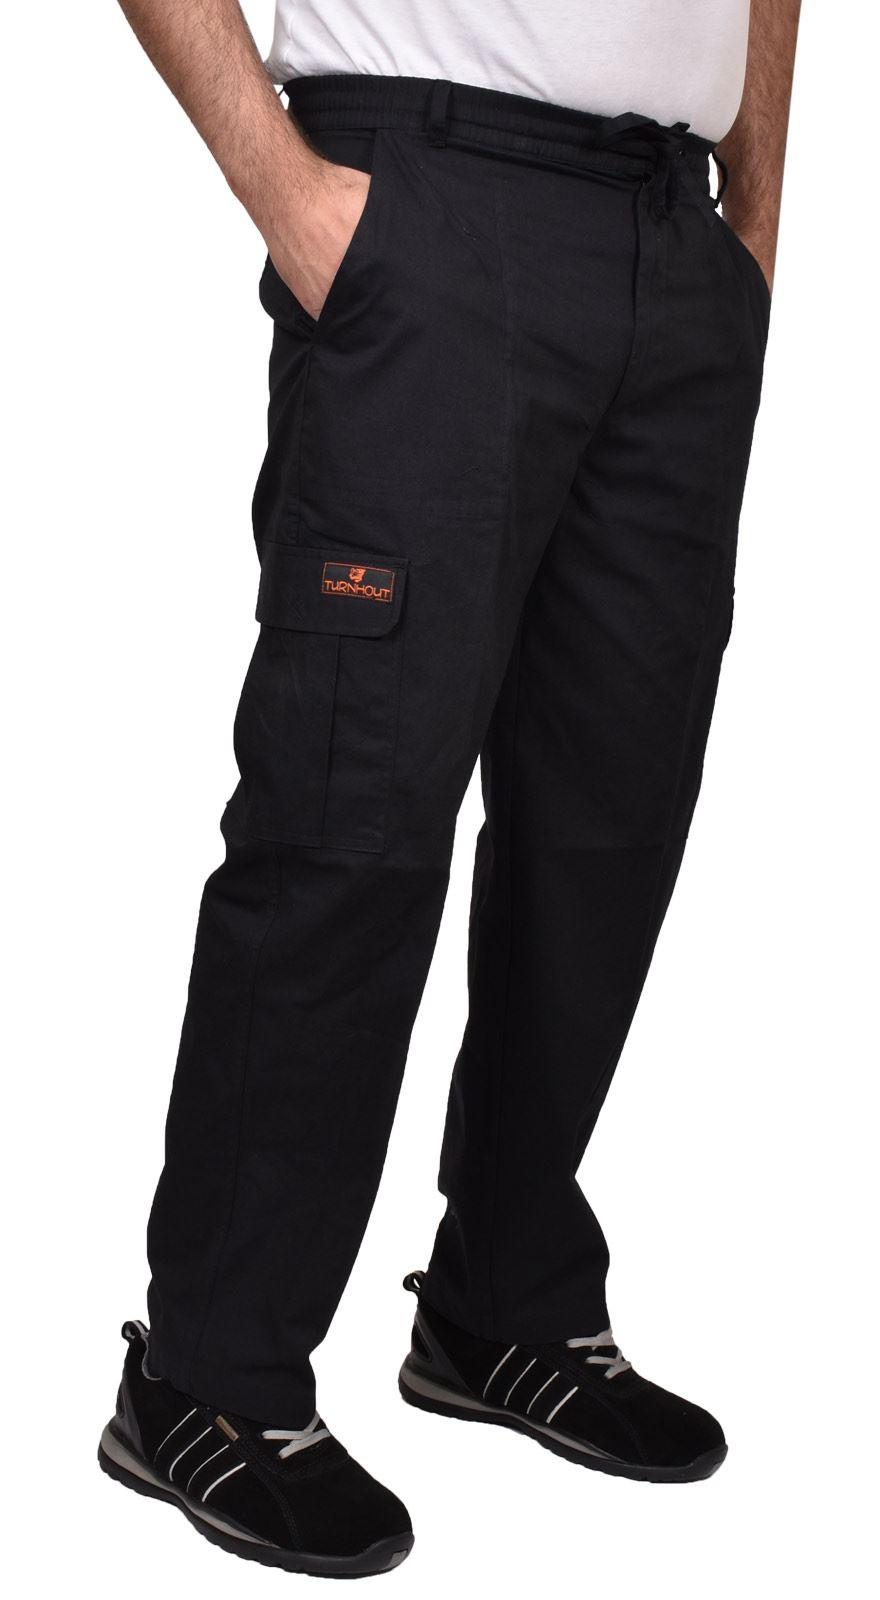 Para-Hombre-De-Carga-Combate-Pantalones-De-Trabajo-Bolsillos-Patrulla-Tactico-Pro-Algodon-Pantalones miniatura 5